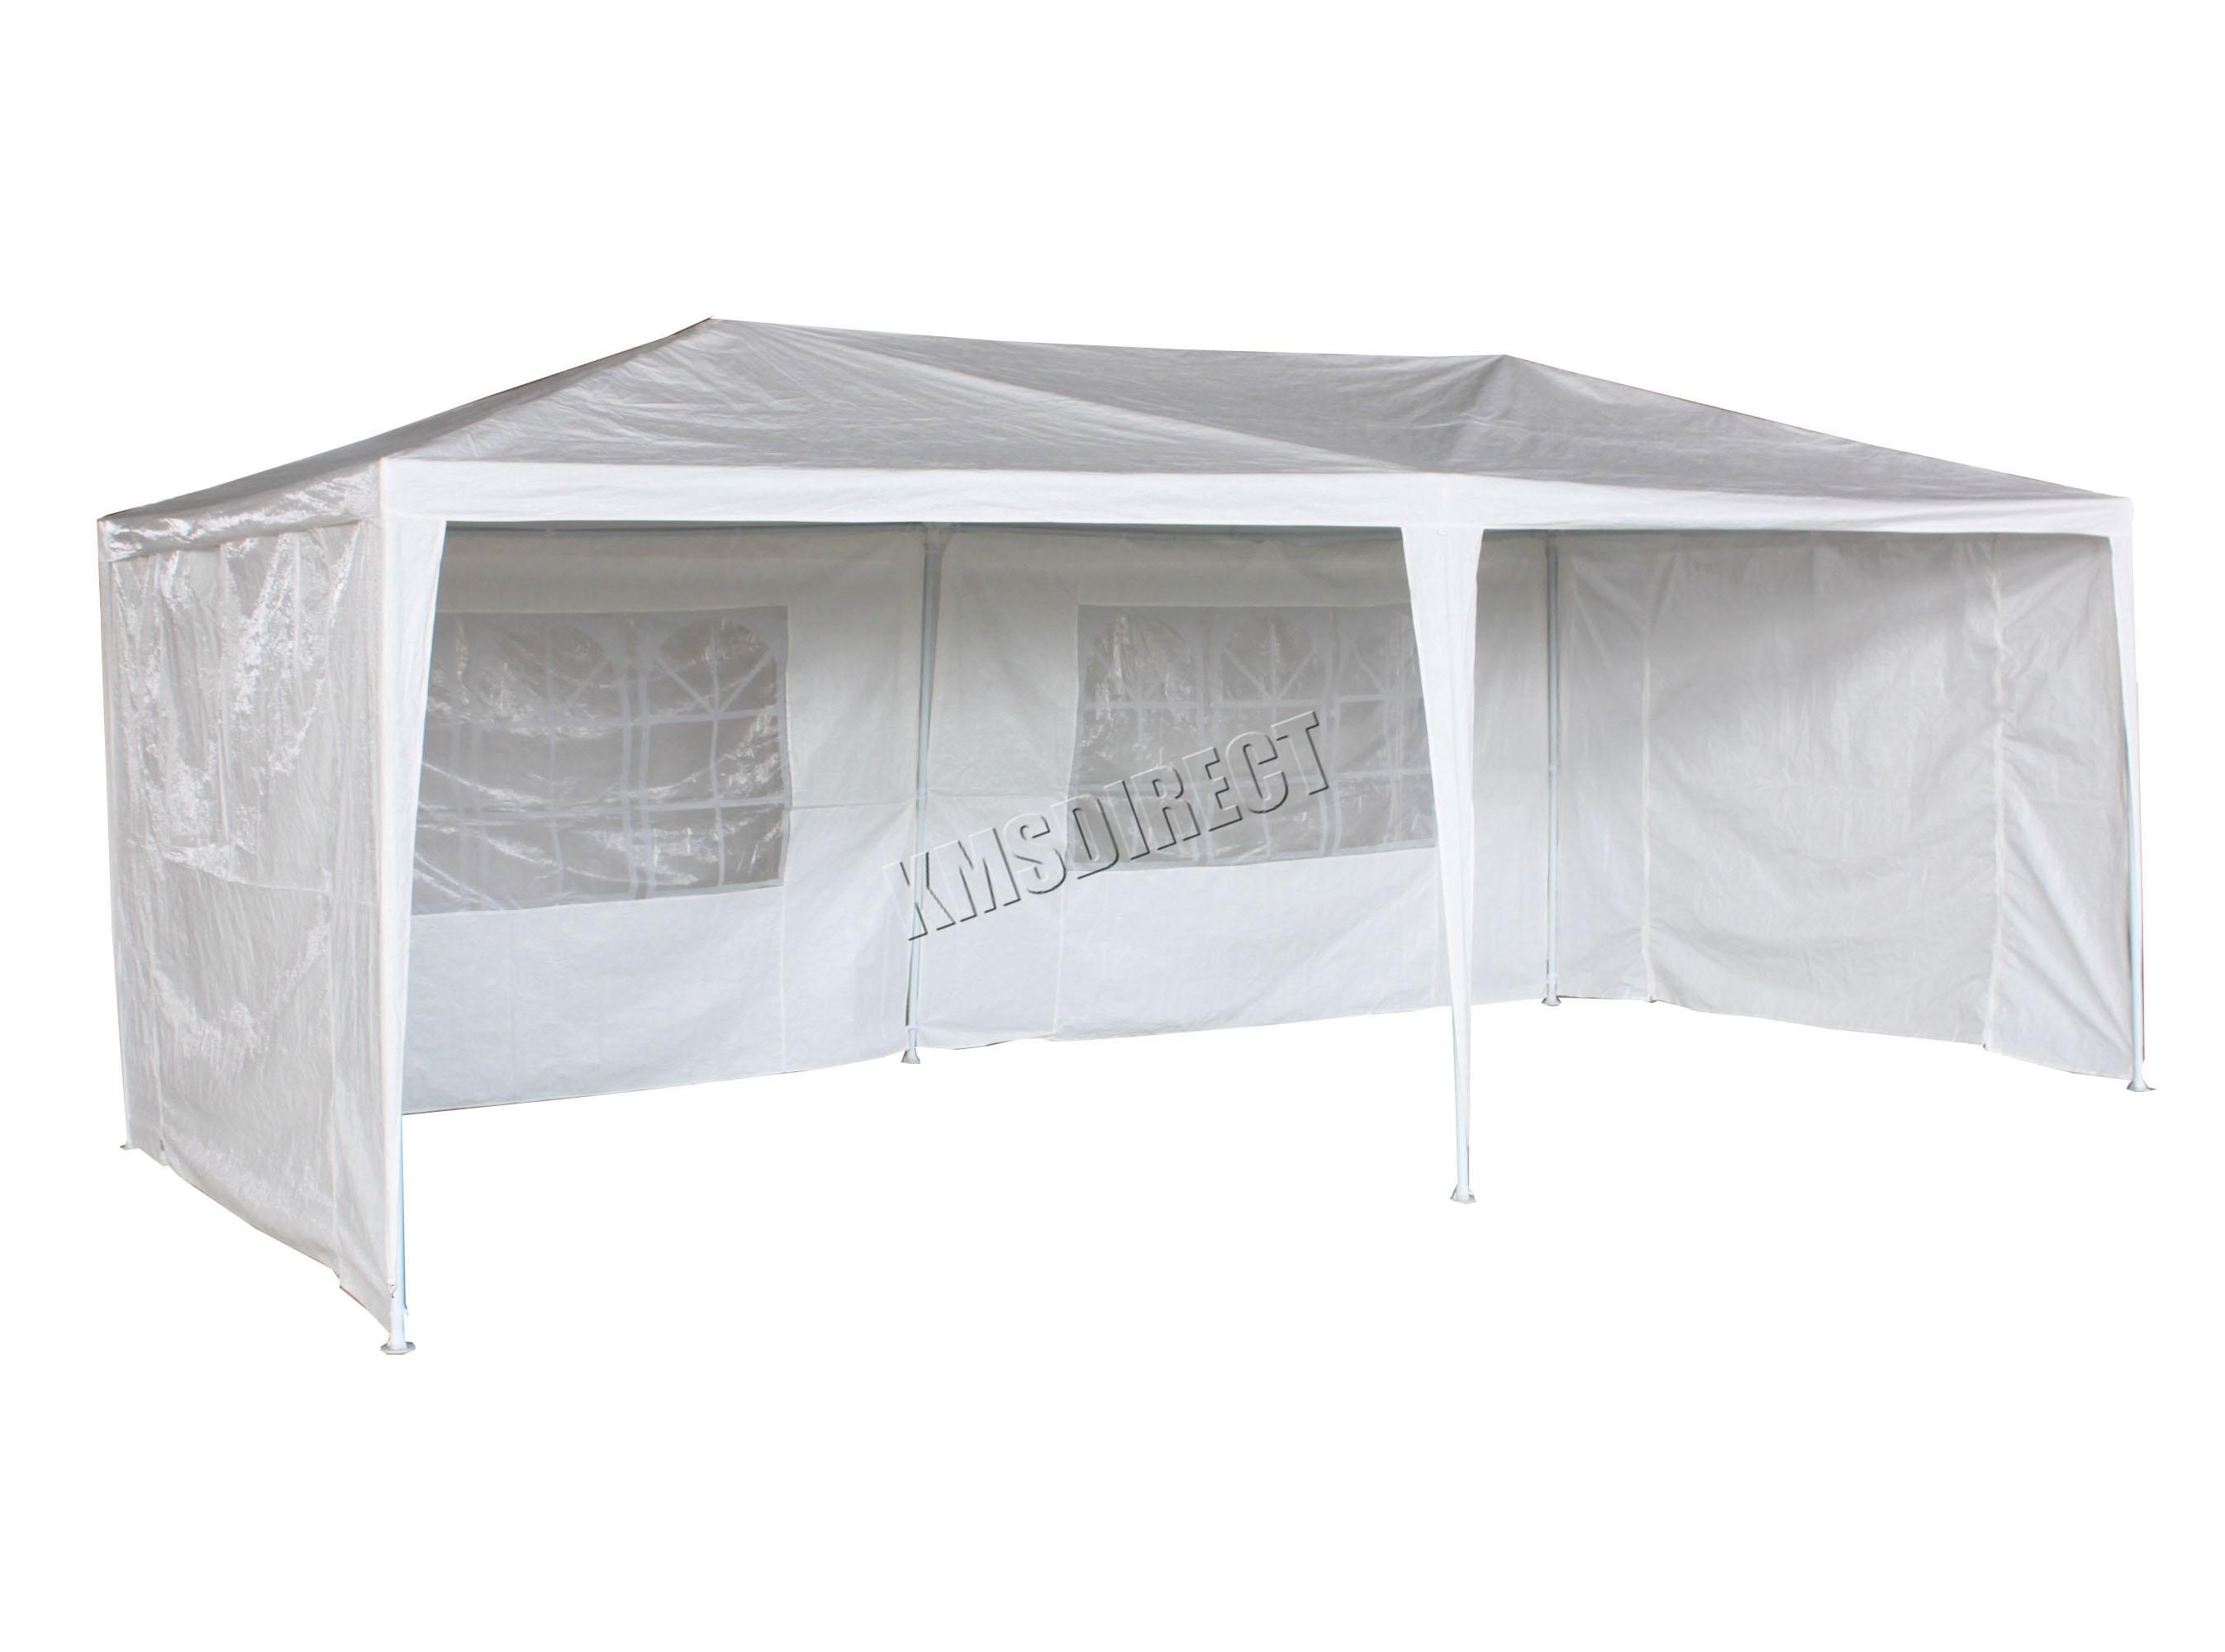 3m x 6m 120g wasserdicht outdoor pe garten gazebo pavillon berdachung partyzelt neu ebay. Black Bedroom Furniture Sets. Home Design Ideas